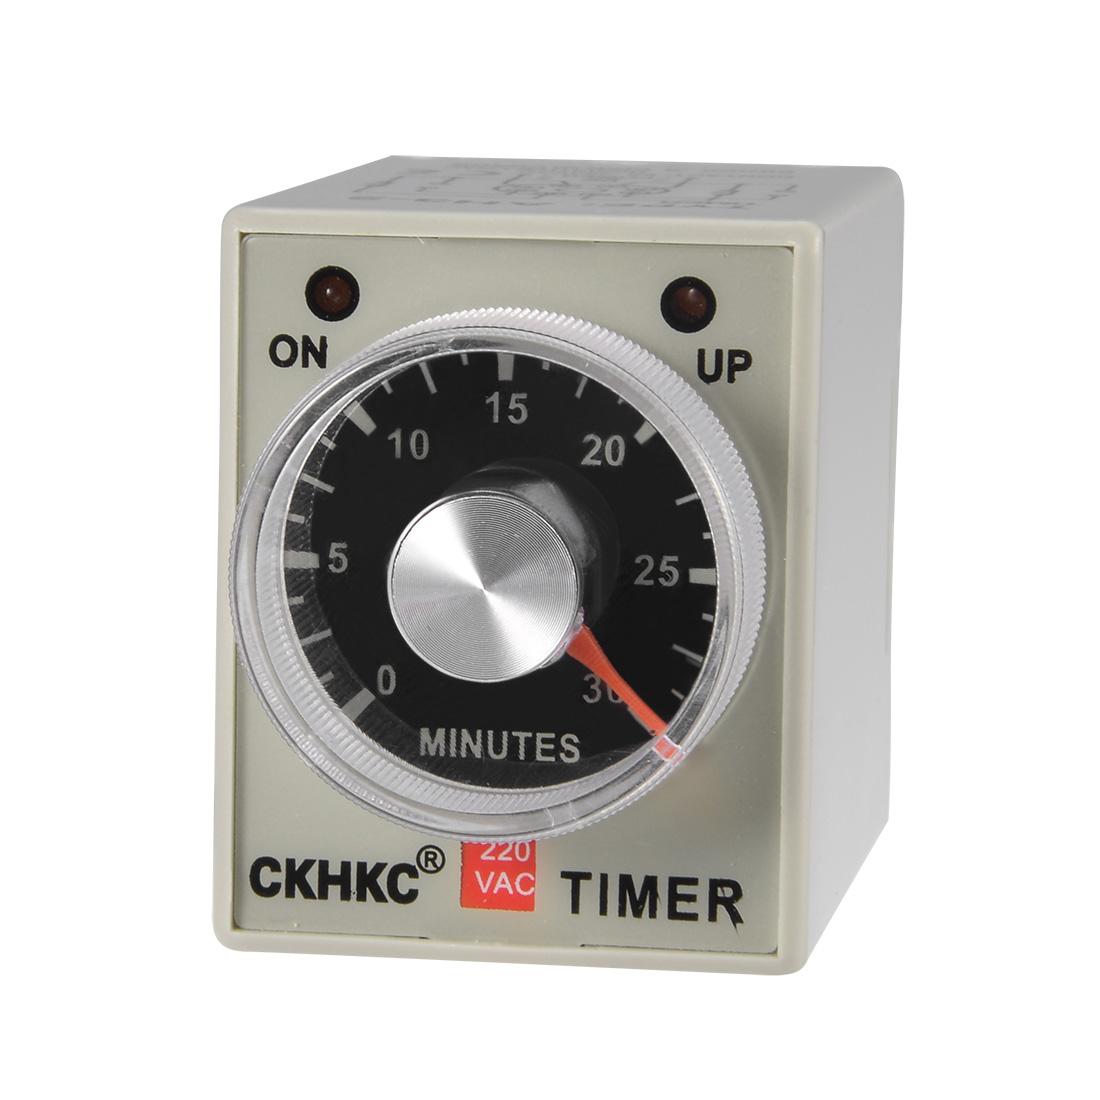 AC220V 30M 8 Terminals Range Adjustable Delay Timer Time Relay AH3-2